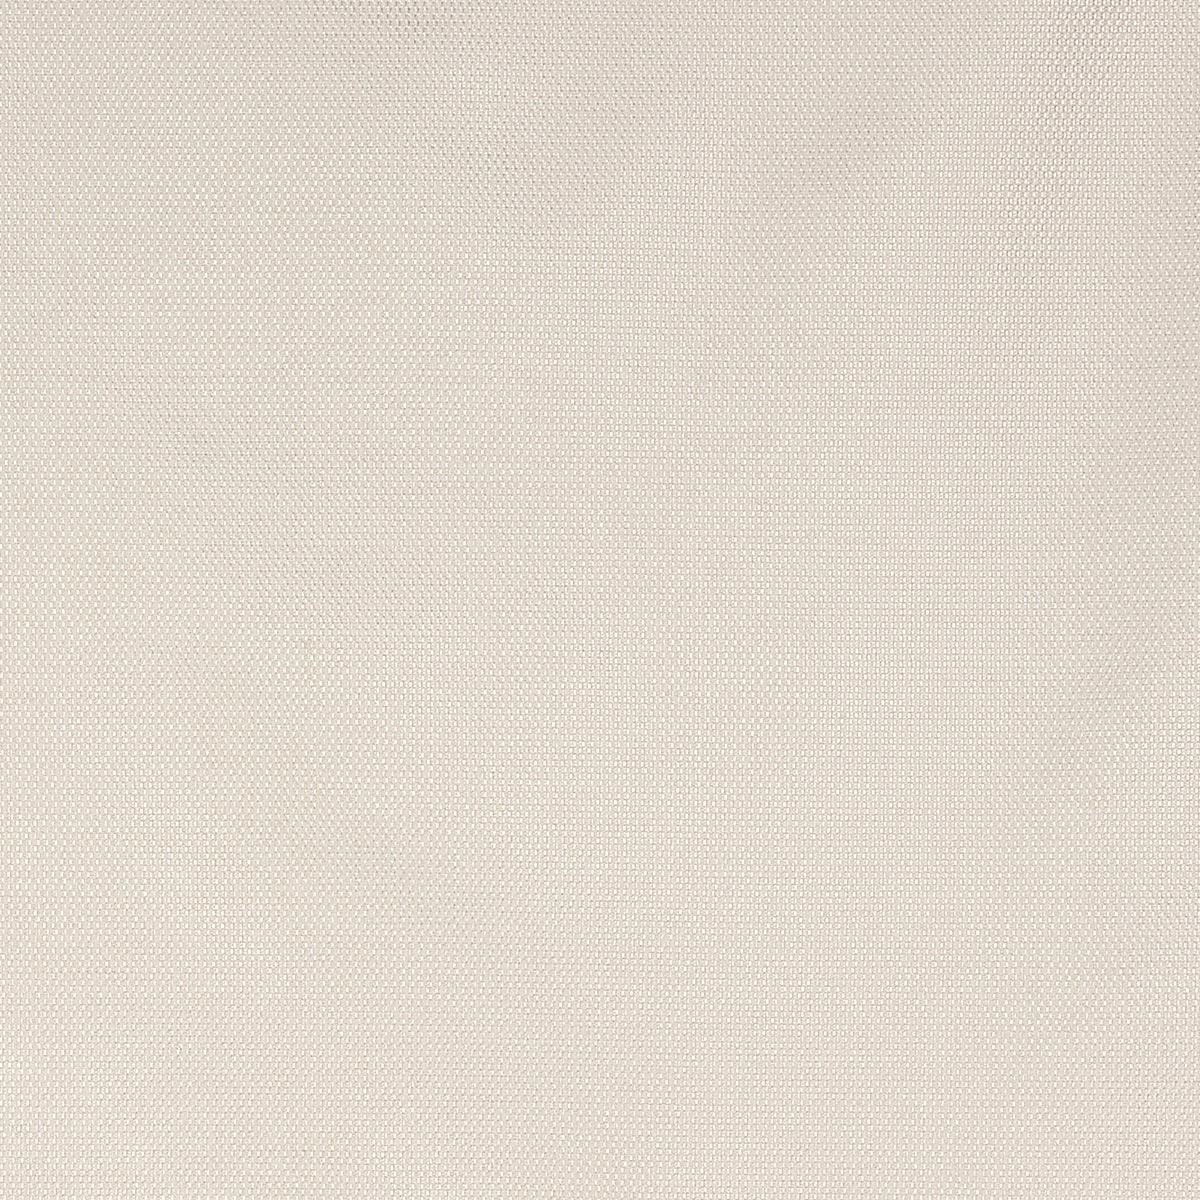 Tissu occultant uni en 100% polyester